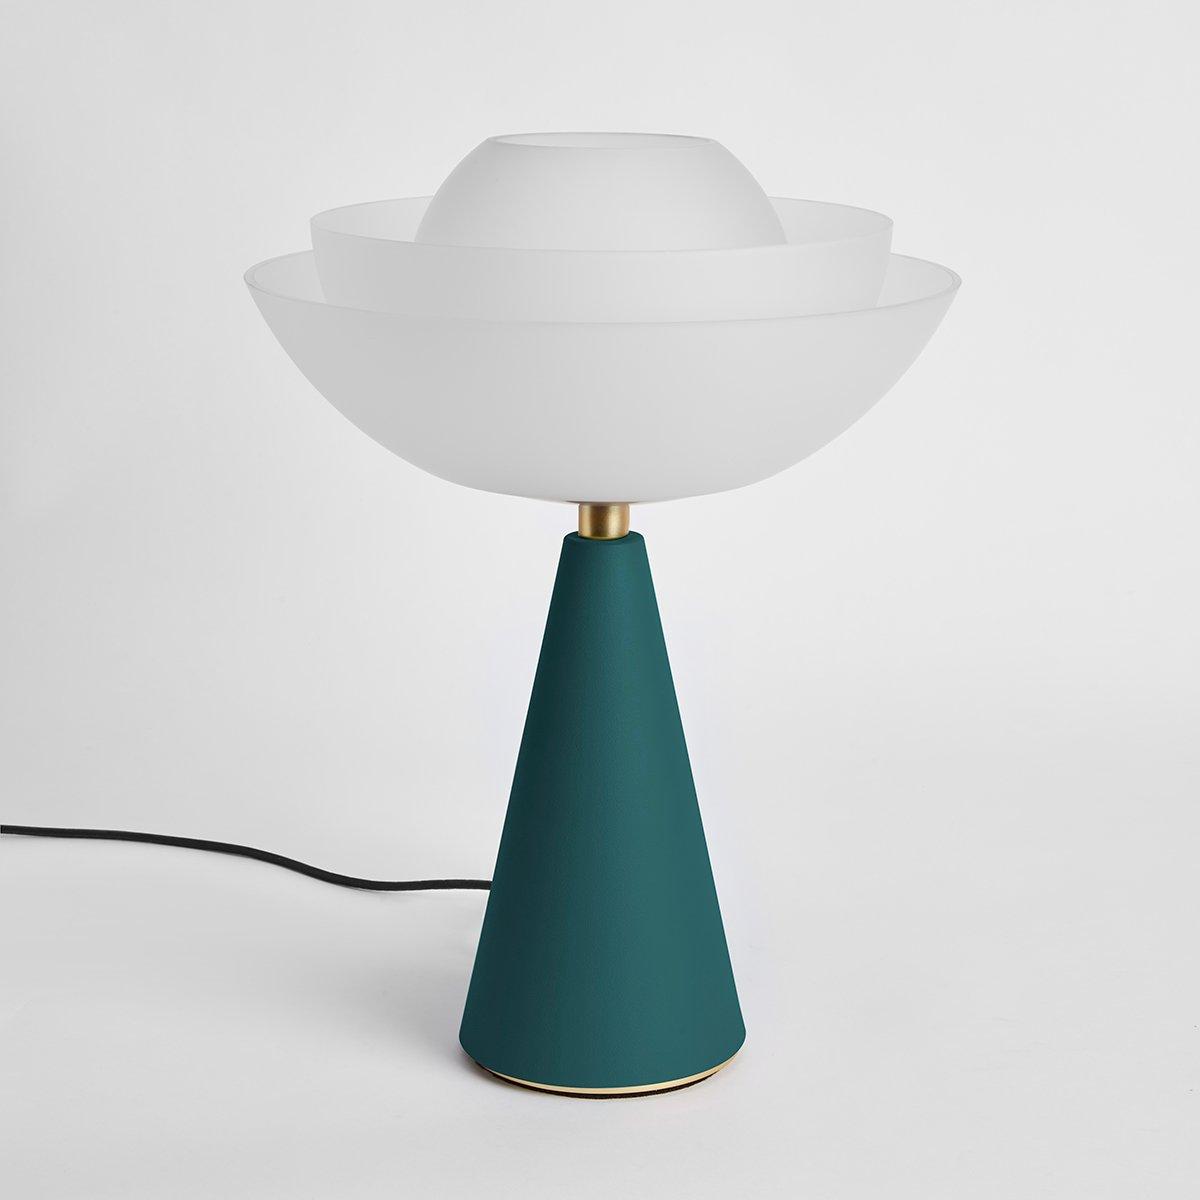 Lotus Tischlampe in Petrolblau von Serena Confalonieri für Mason Editi...